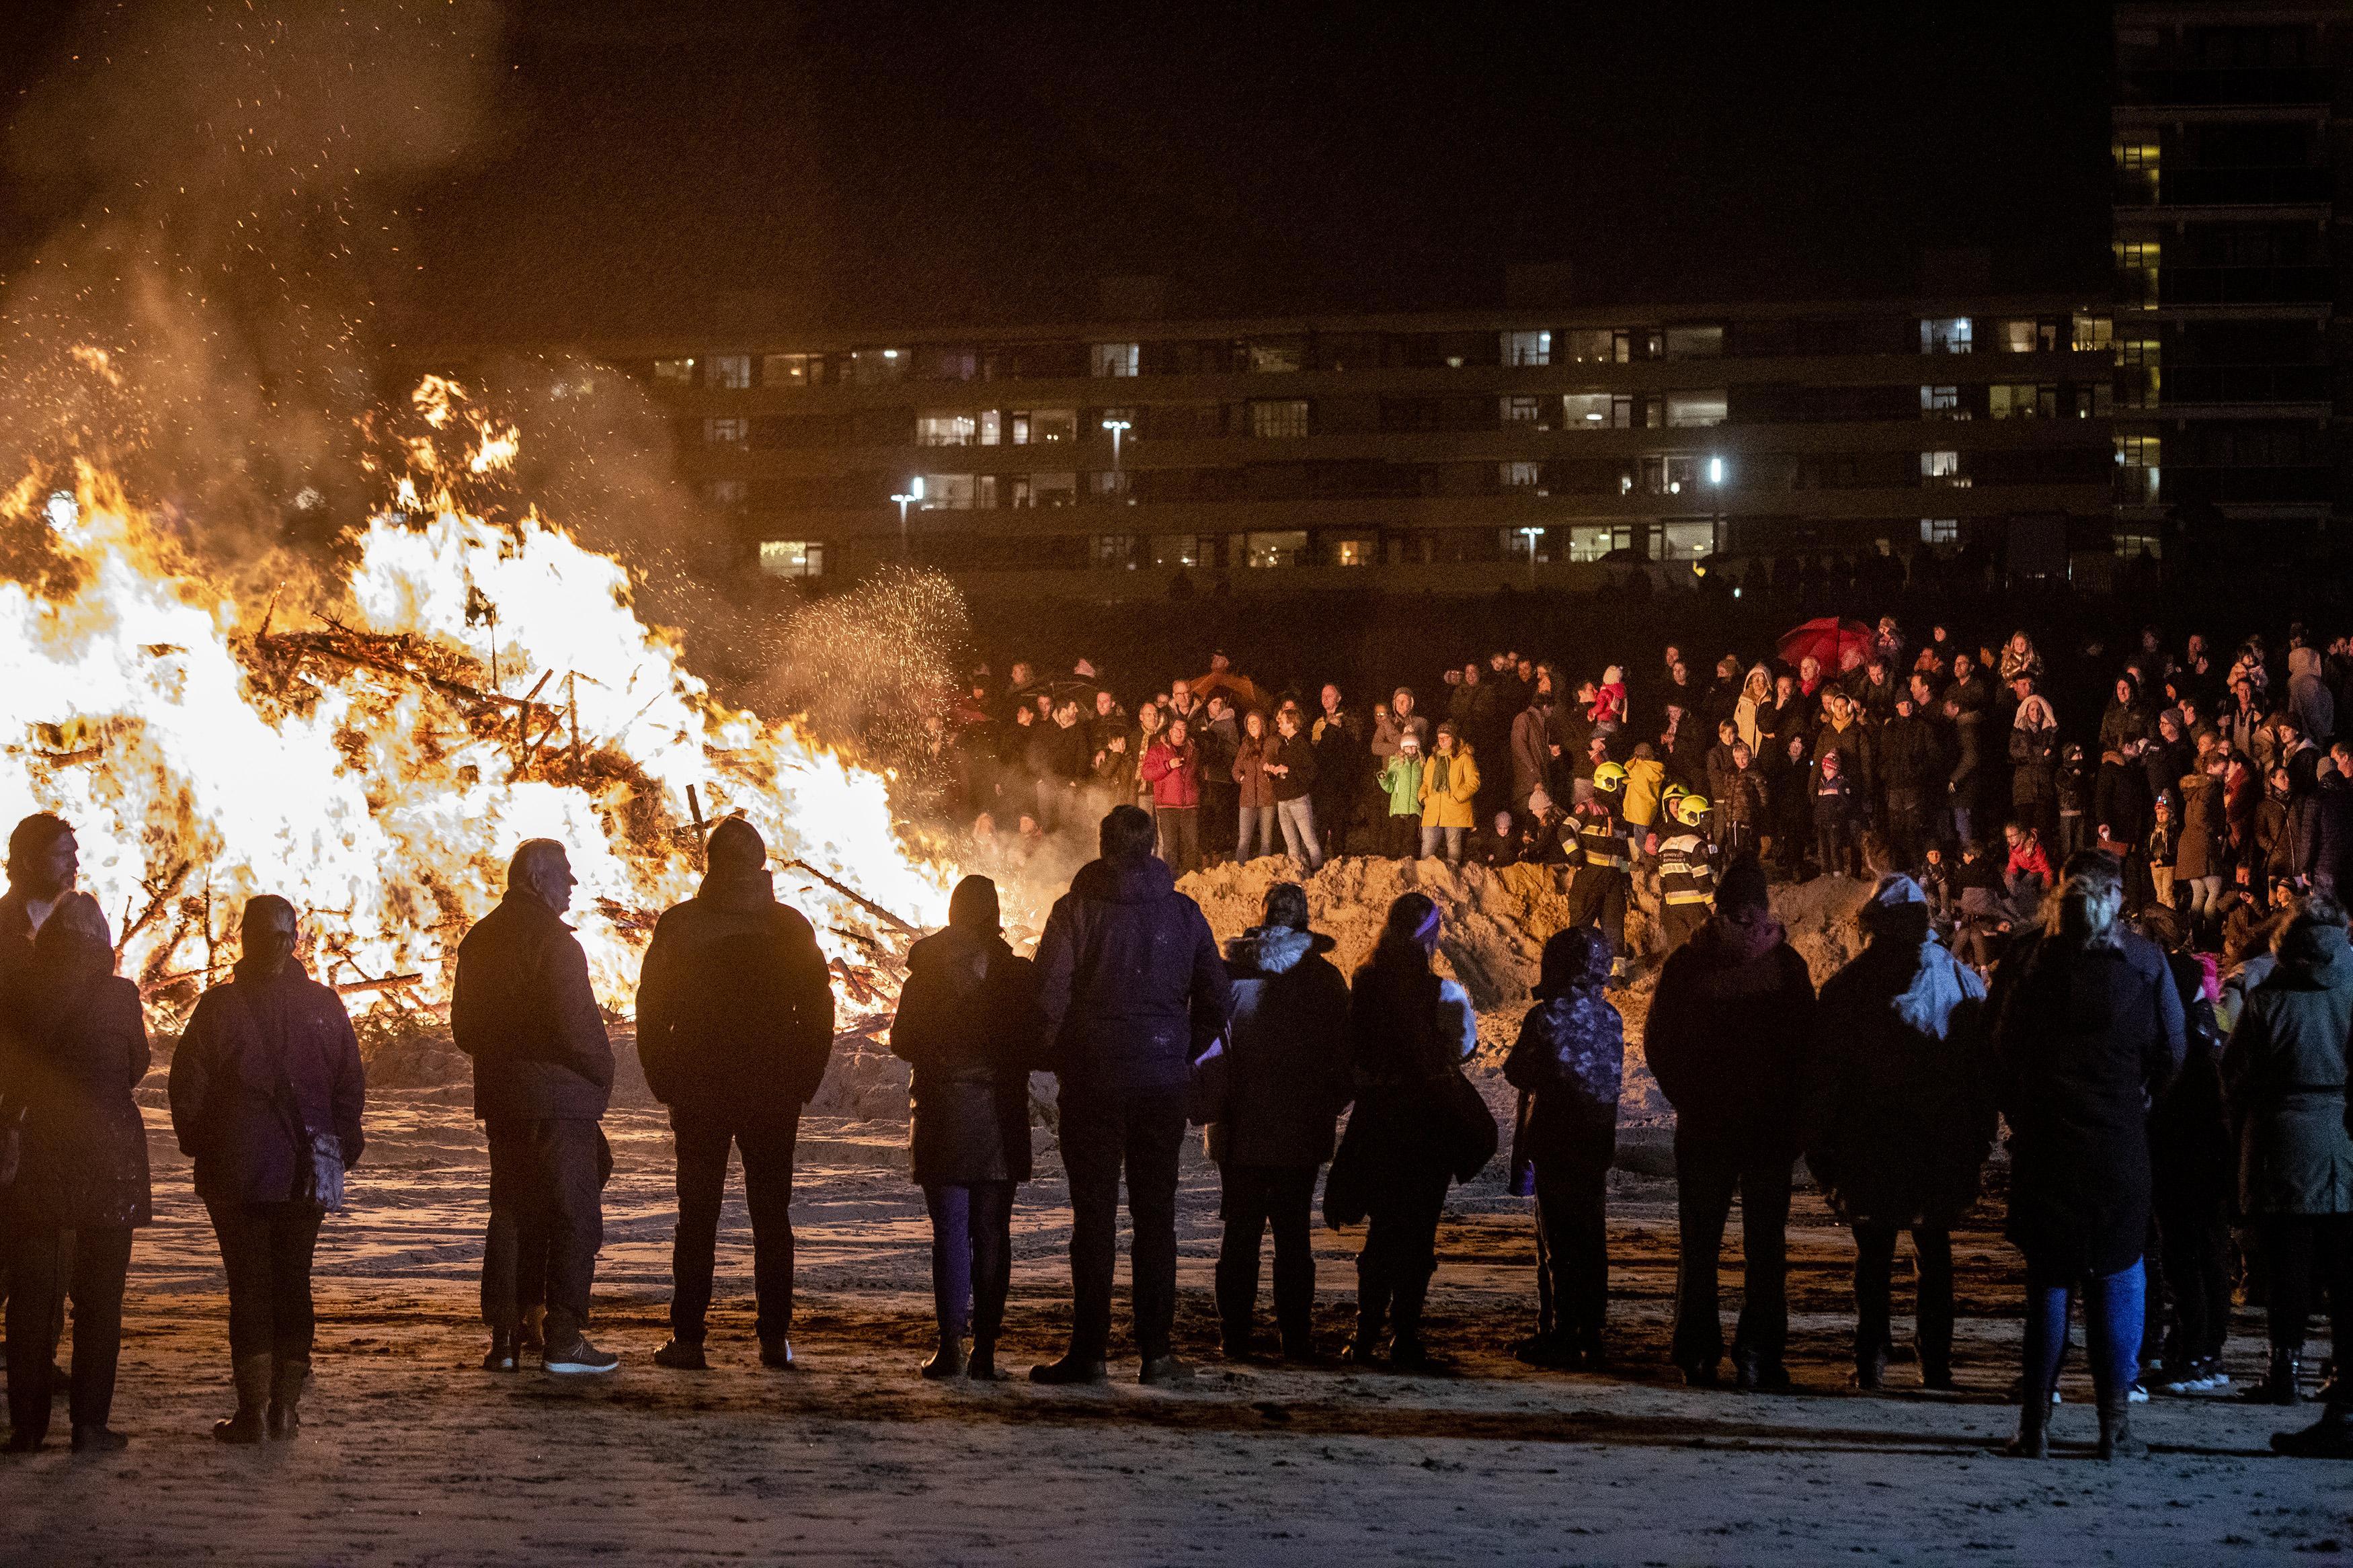 Kerstboomverbranding: Vlammende traditie op strand Zandvoort